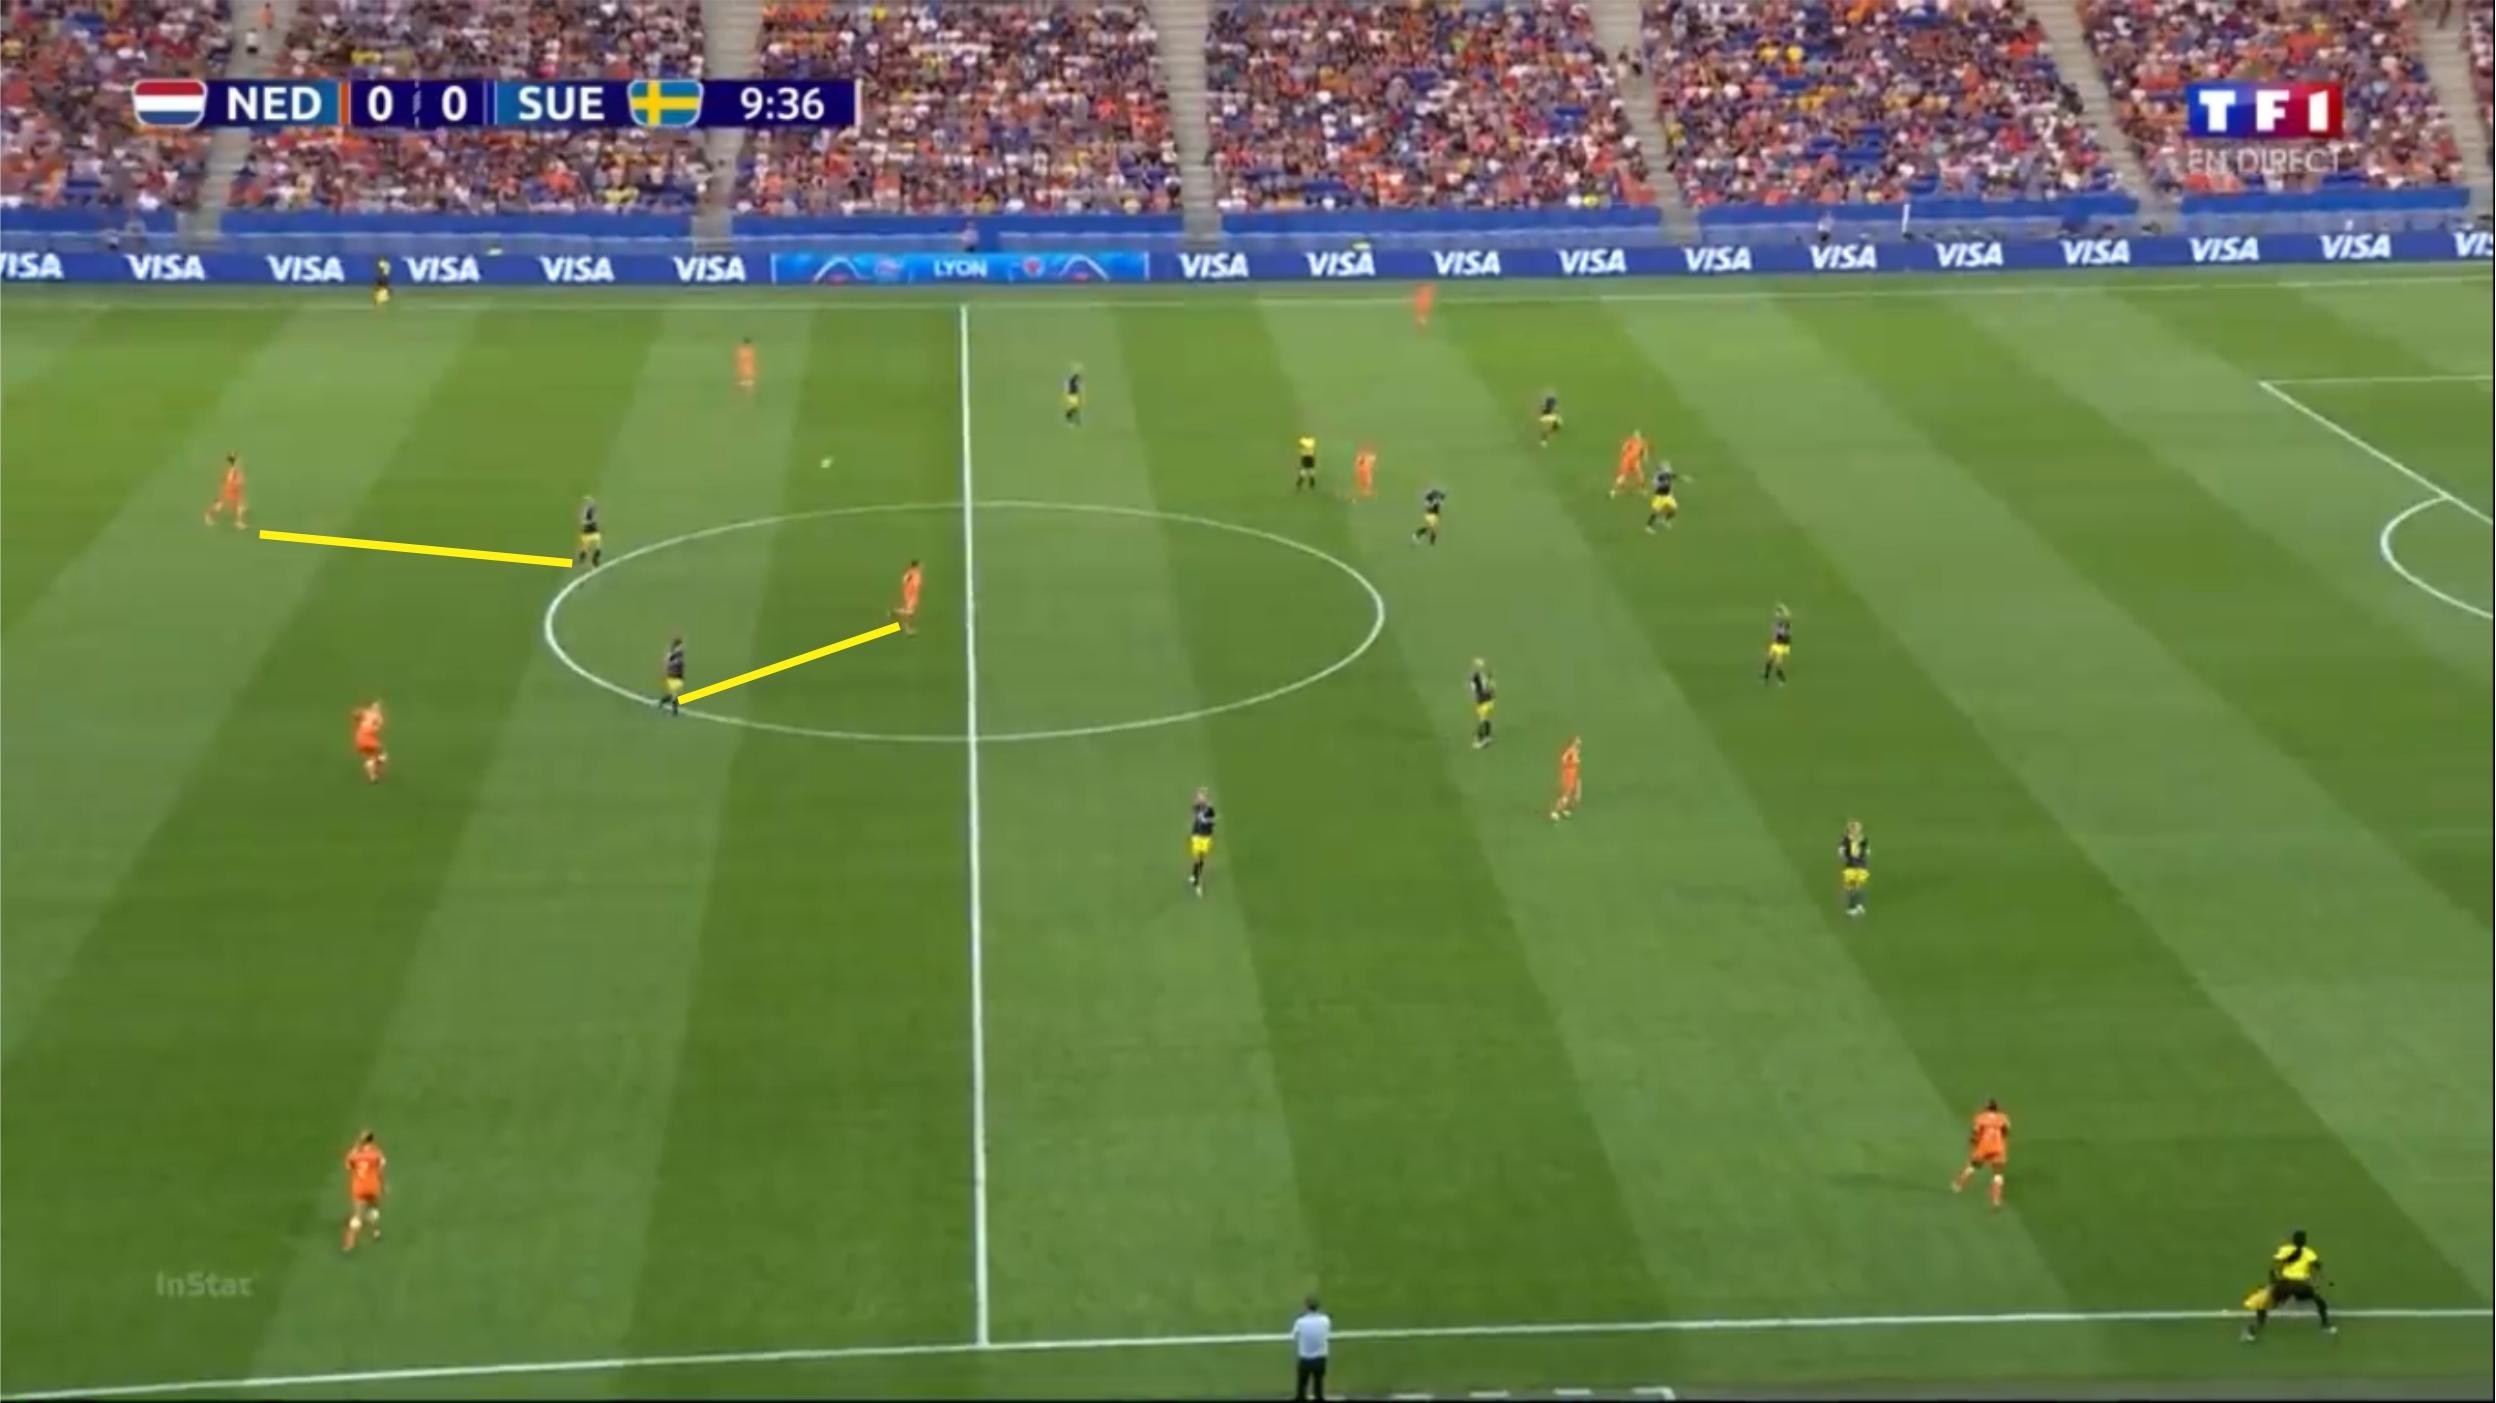 FIFA Women's World Cup 2019: Netherlands vs Sweden - tactical analysis tactics